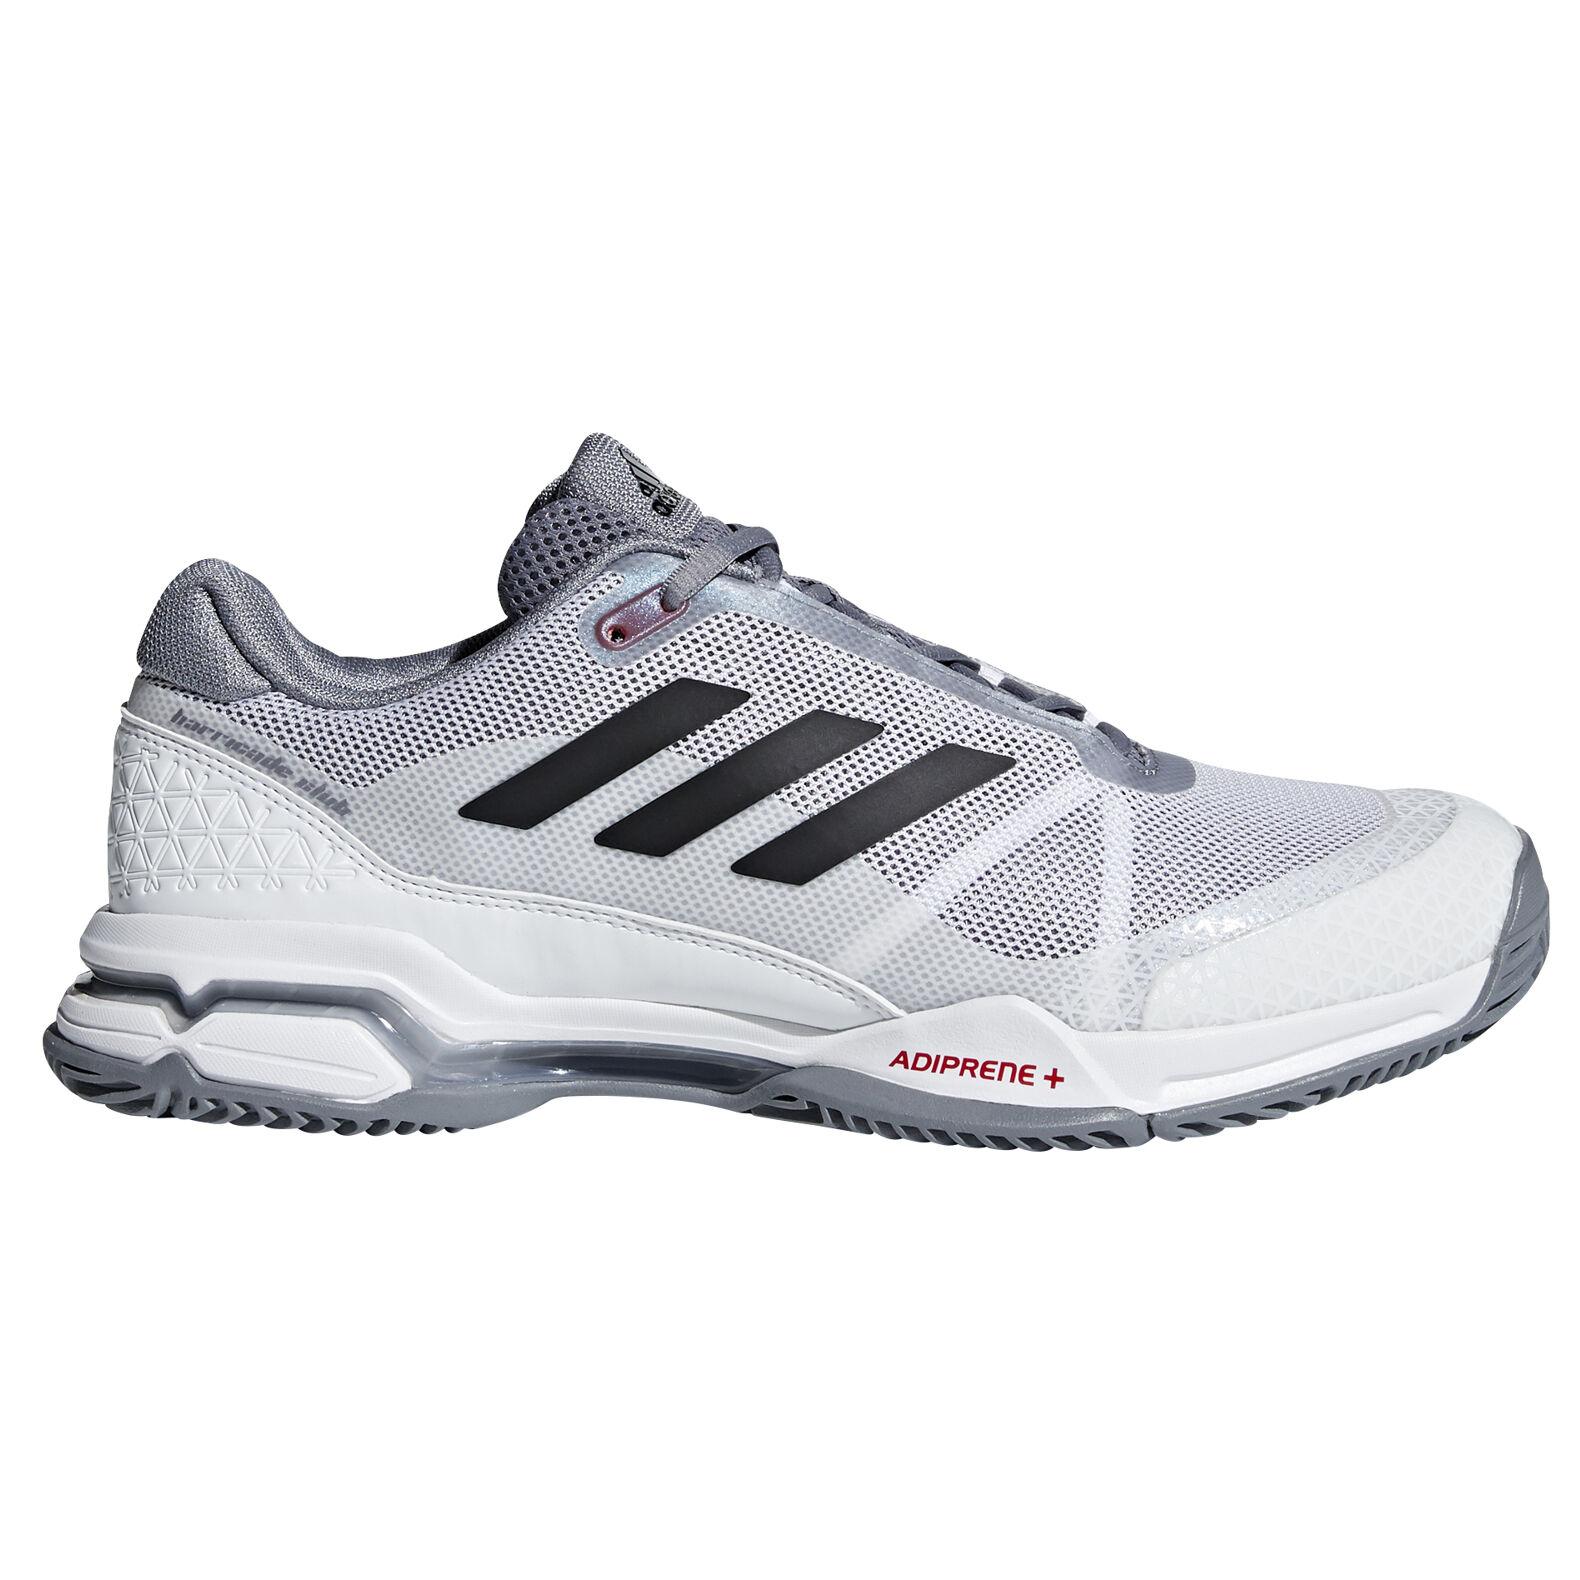 adidas Barricade Club Men's Tennis Shoe - White/Black